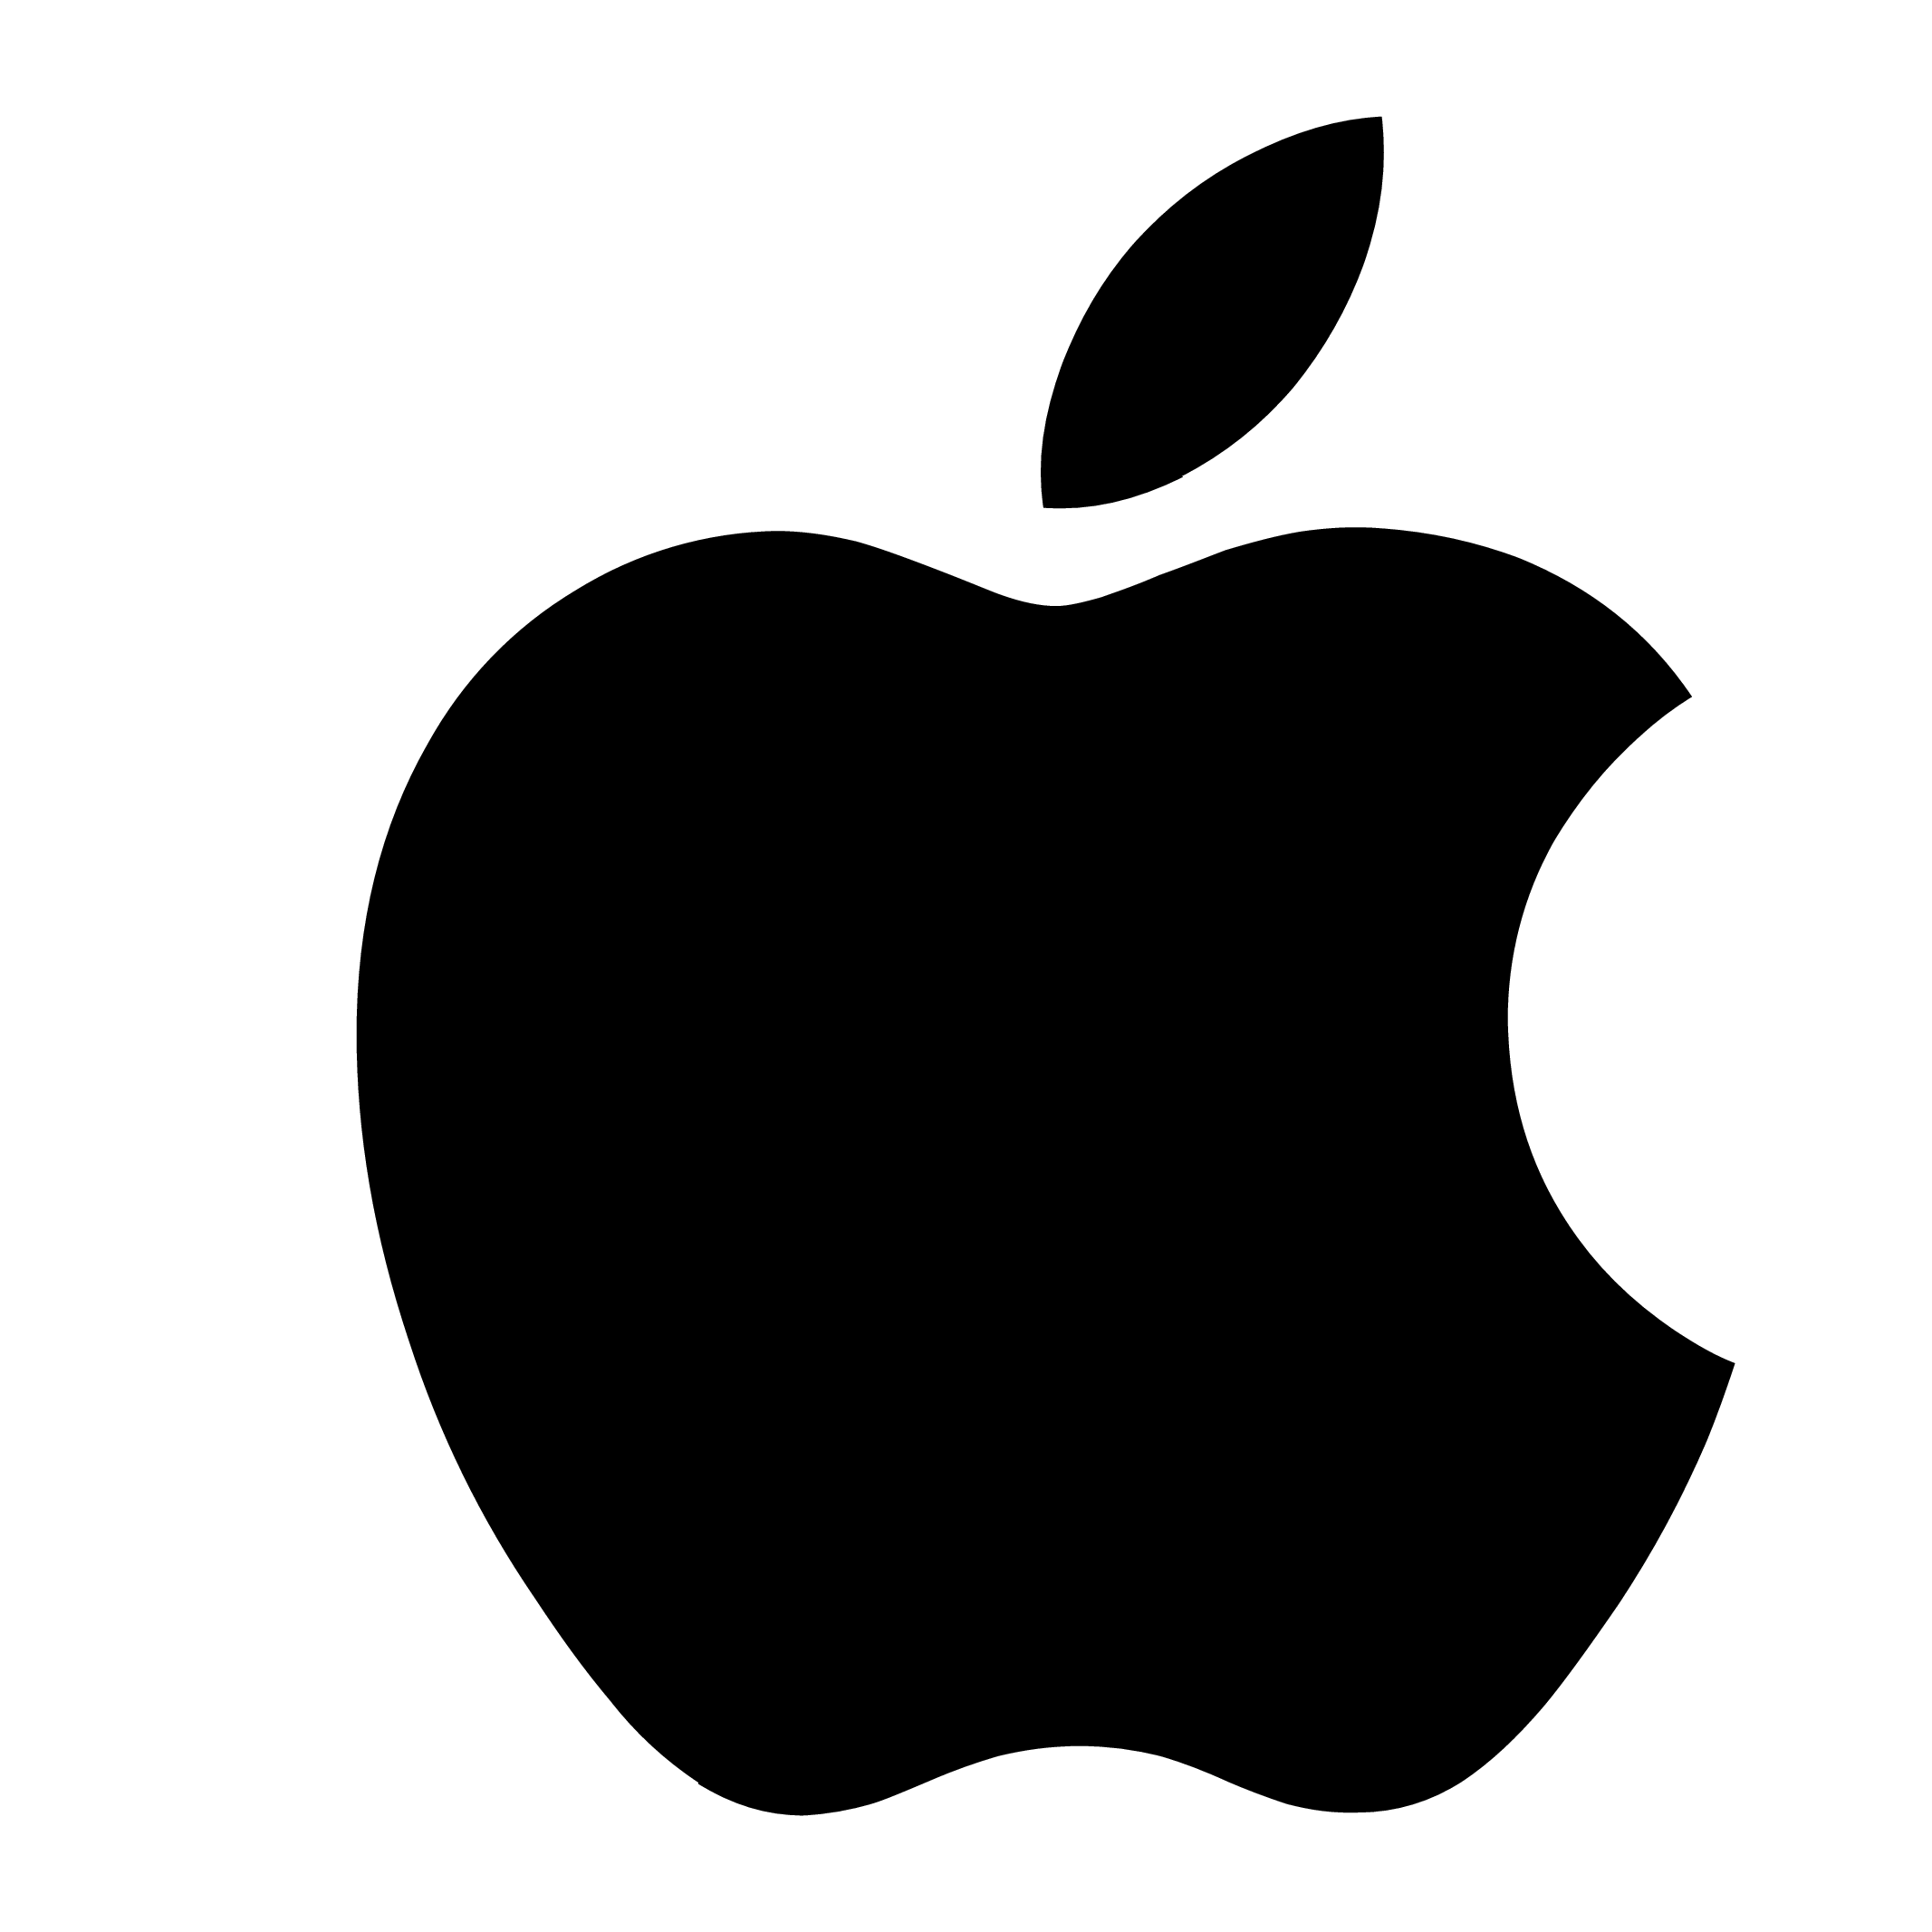 apple logo png transparent